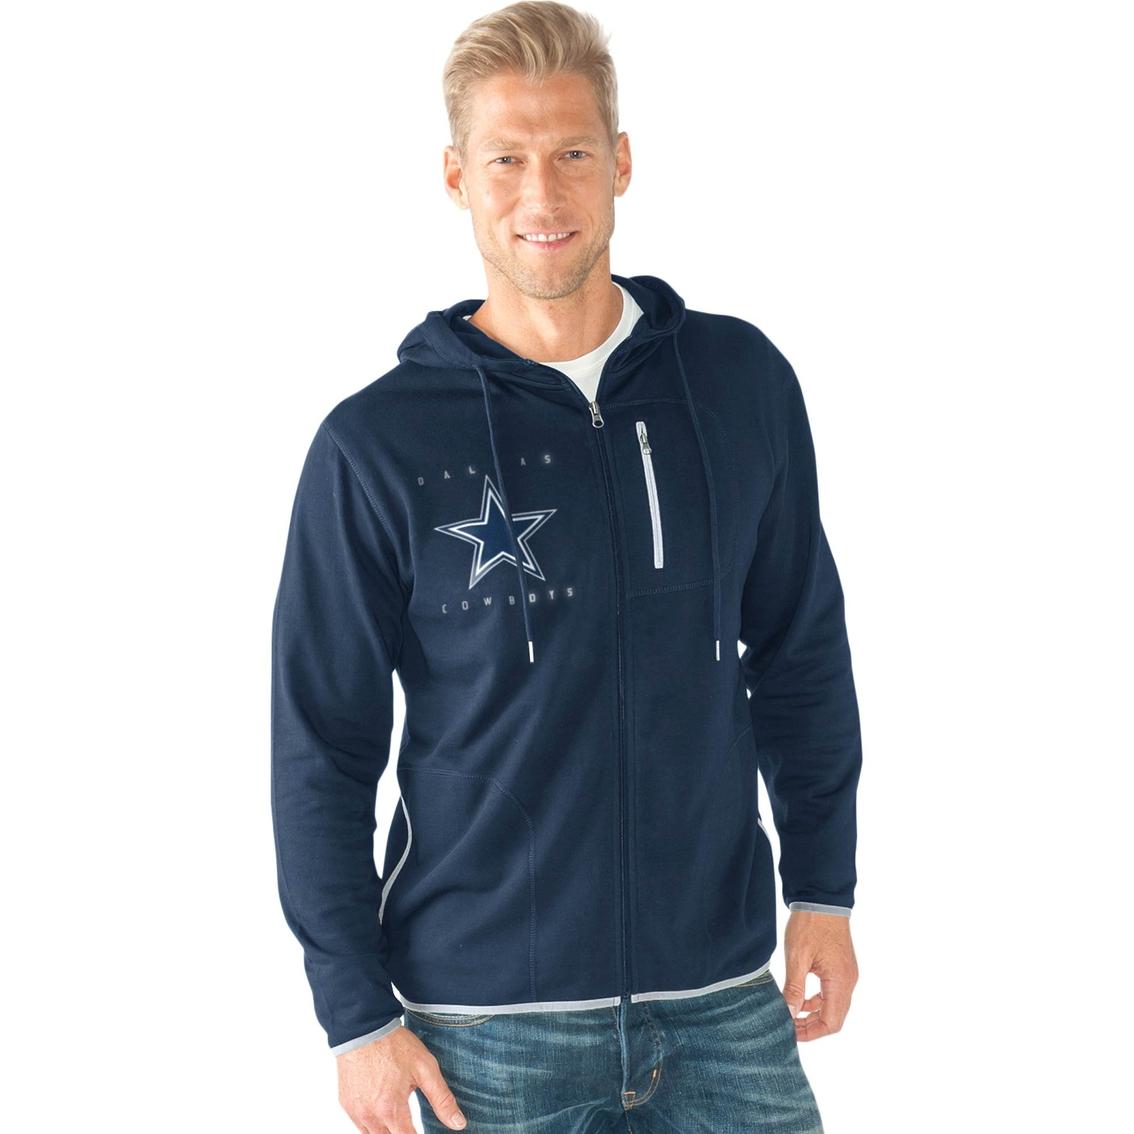 wholesale dealer 4b9fc f8c3c G-III Sports NFL Dallas Cowboys Team Men s Kicker Hoodie